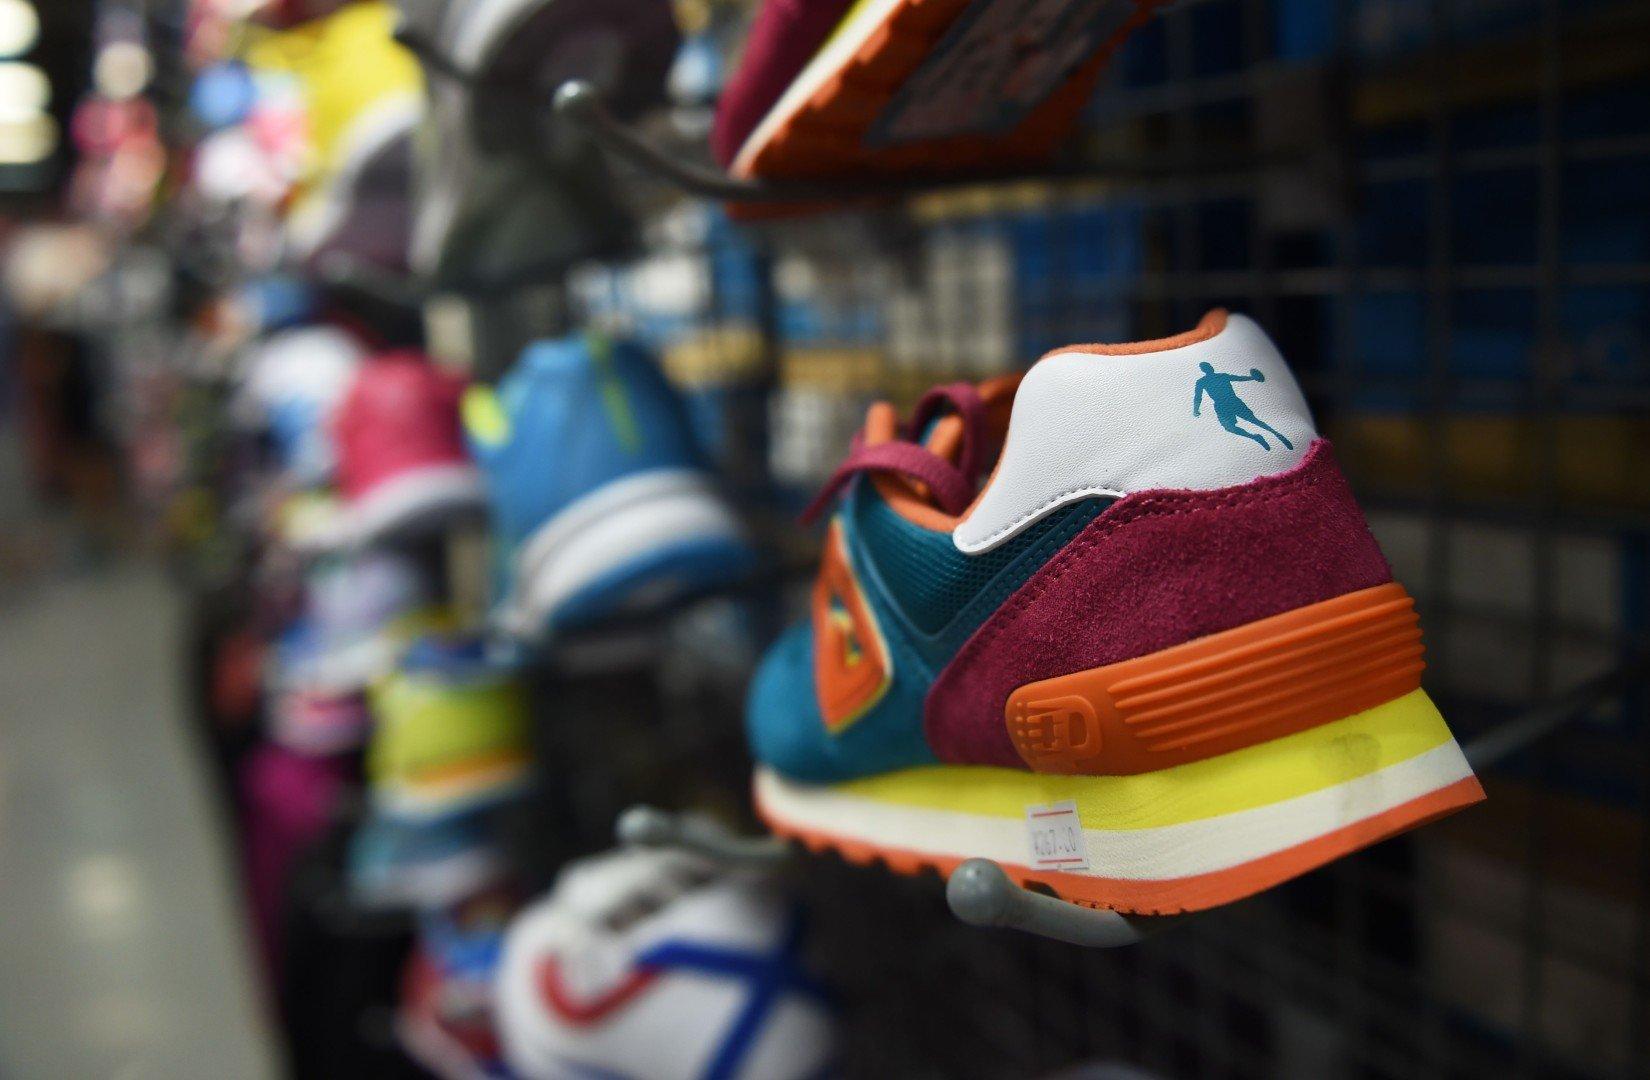 1a2ffc01b0c Chinese swoosh-logo 'Qiodan' shoes don't infringe on Michael Jordan's  famous brand, Beijing court rules | South China Morning Post